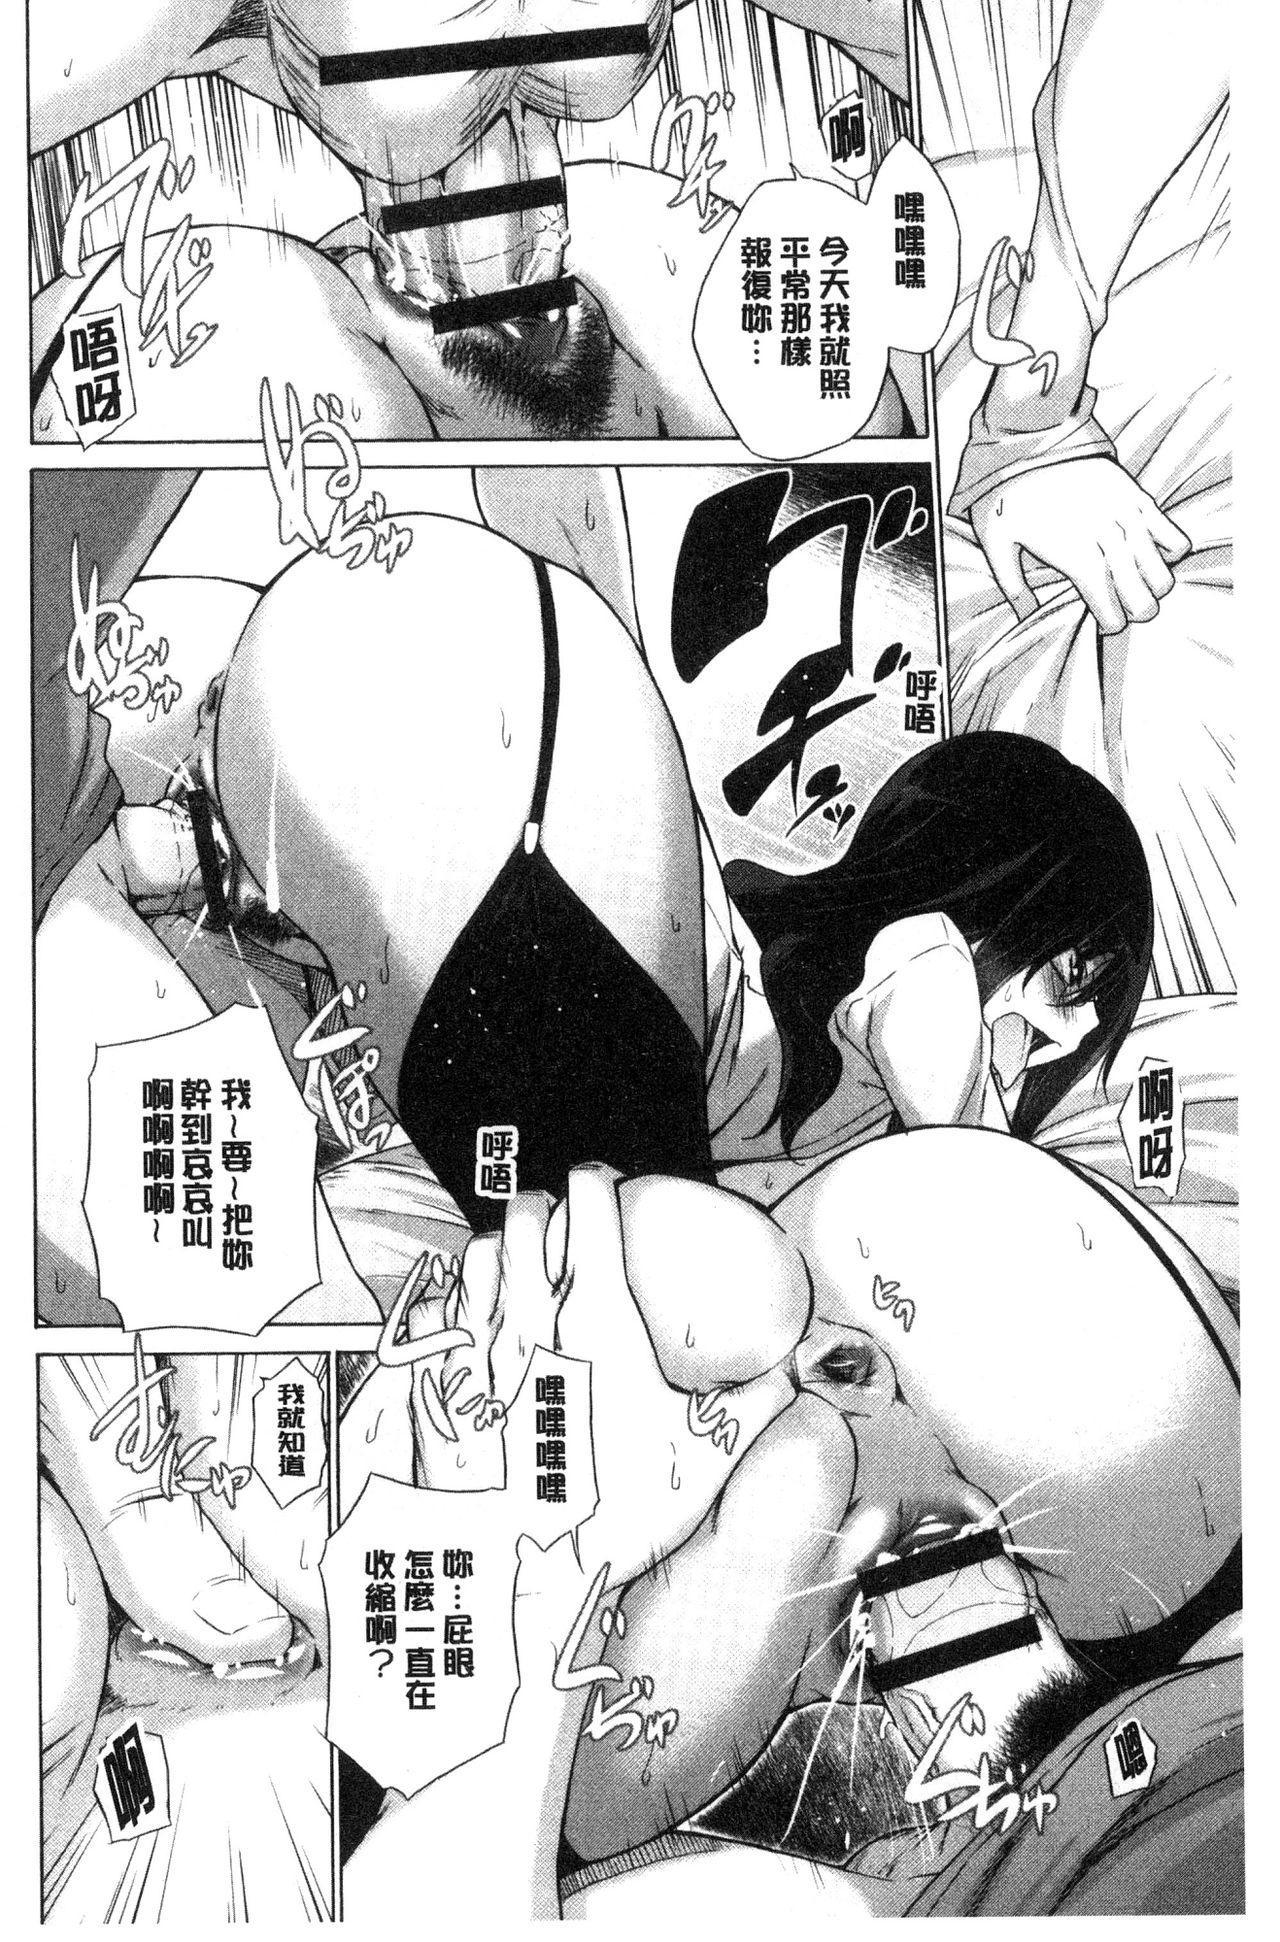 [Miyano Kintarou] Hishoujo List - The Non-Virgin List  | 非處女的名單 [Chinese] 165